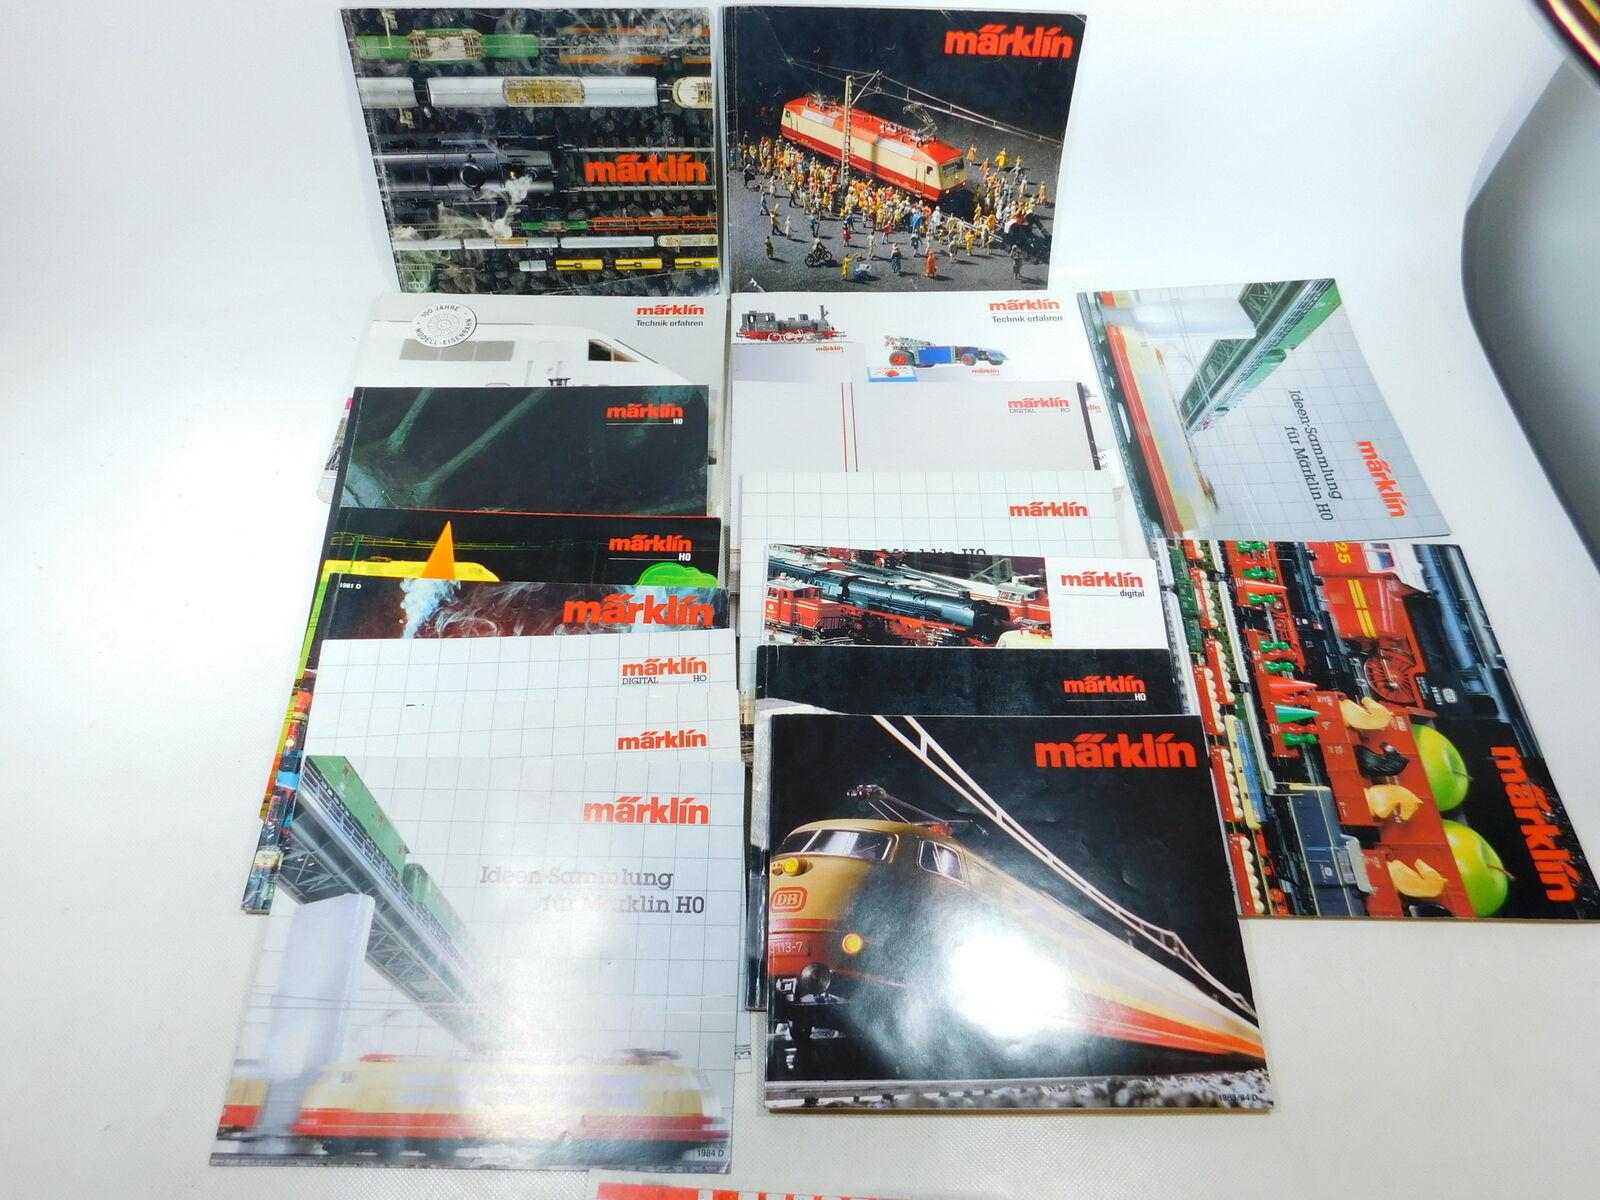 Bw351-6 Bw351-6 Bw351-6  Märklin Catalogo-la raccolta  1979+1980+1981+1982 83+1983+1983 84+1984 etc a08fe6